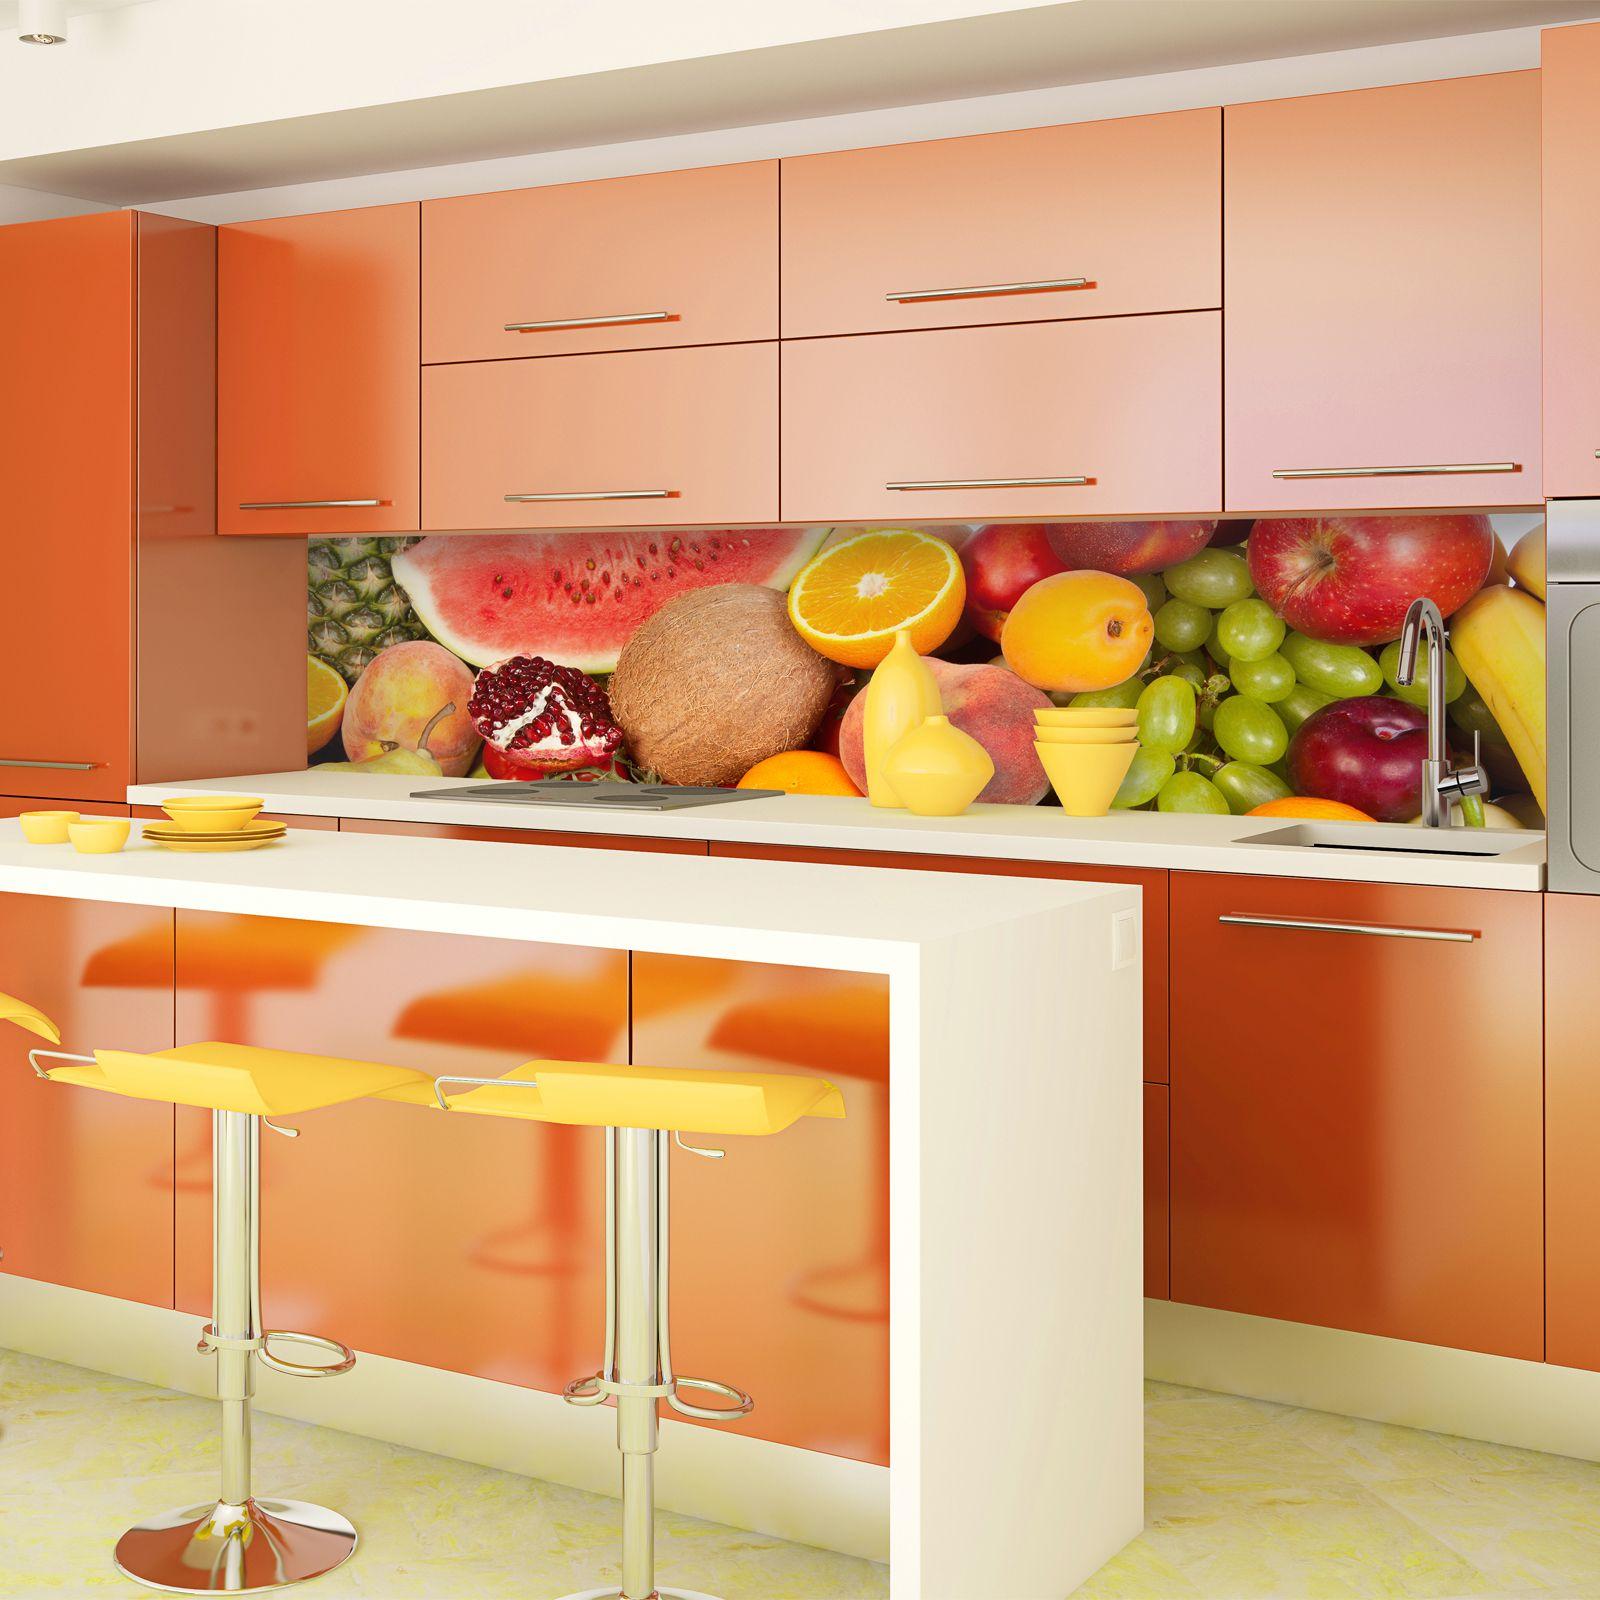 Kitchen Tiles Fruit Design new york skyline (day) acrylic kitchen splashback | enhance your